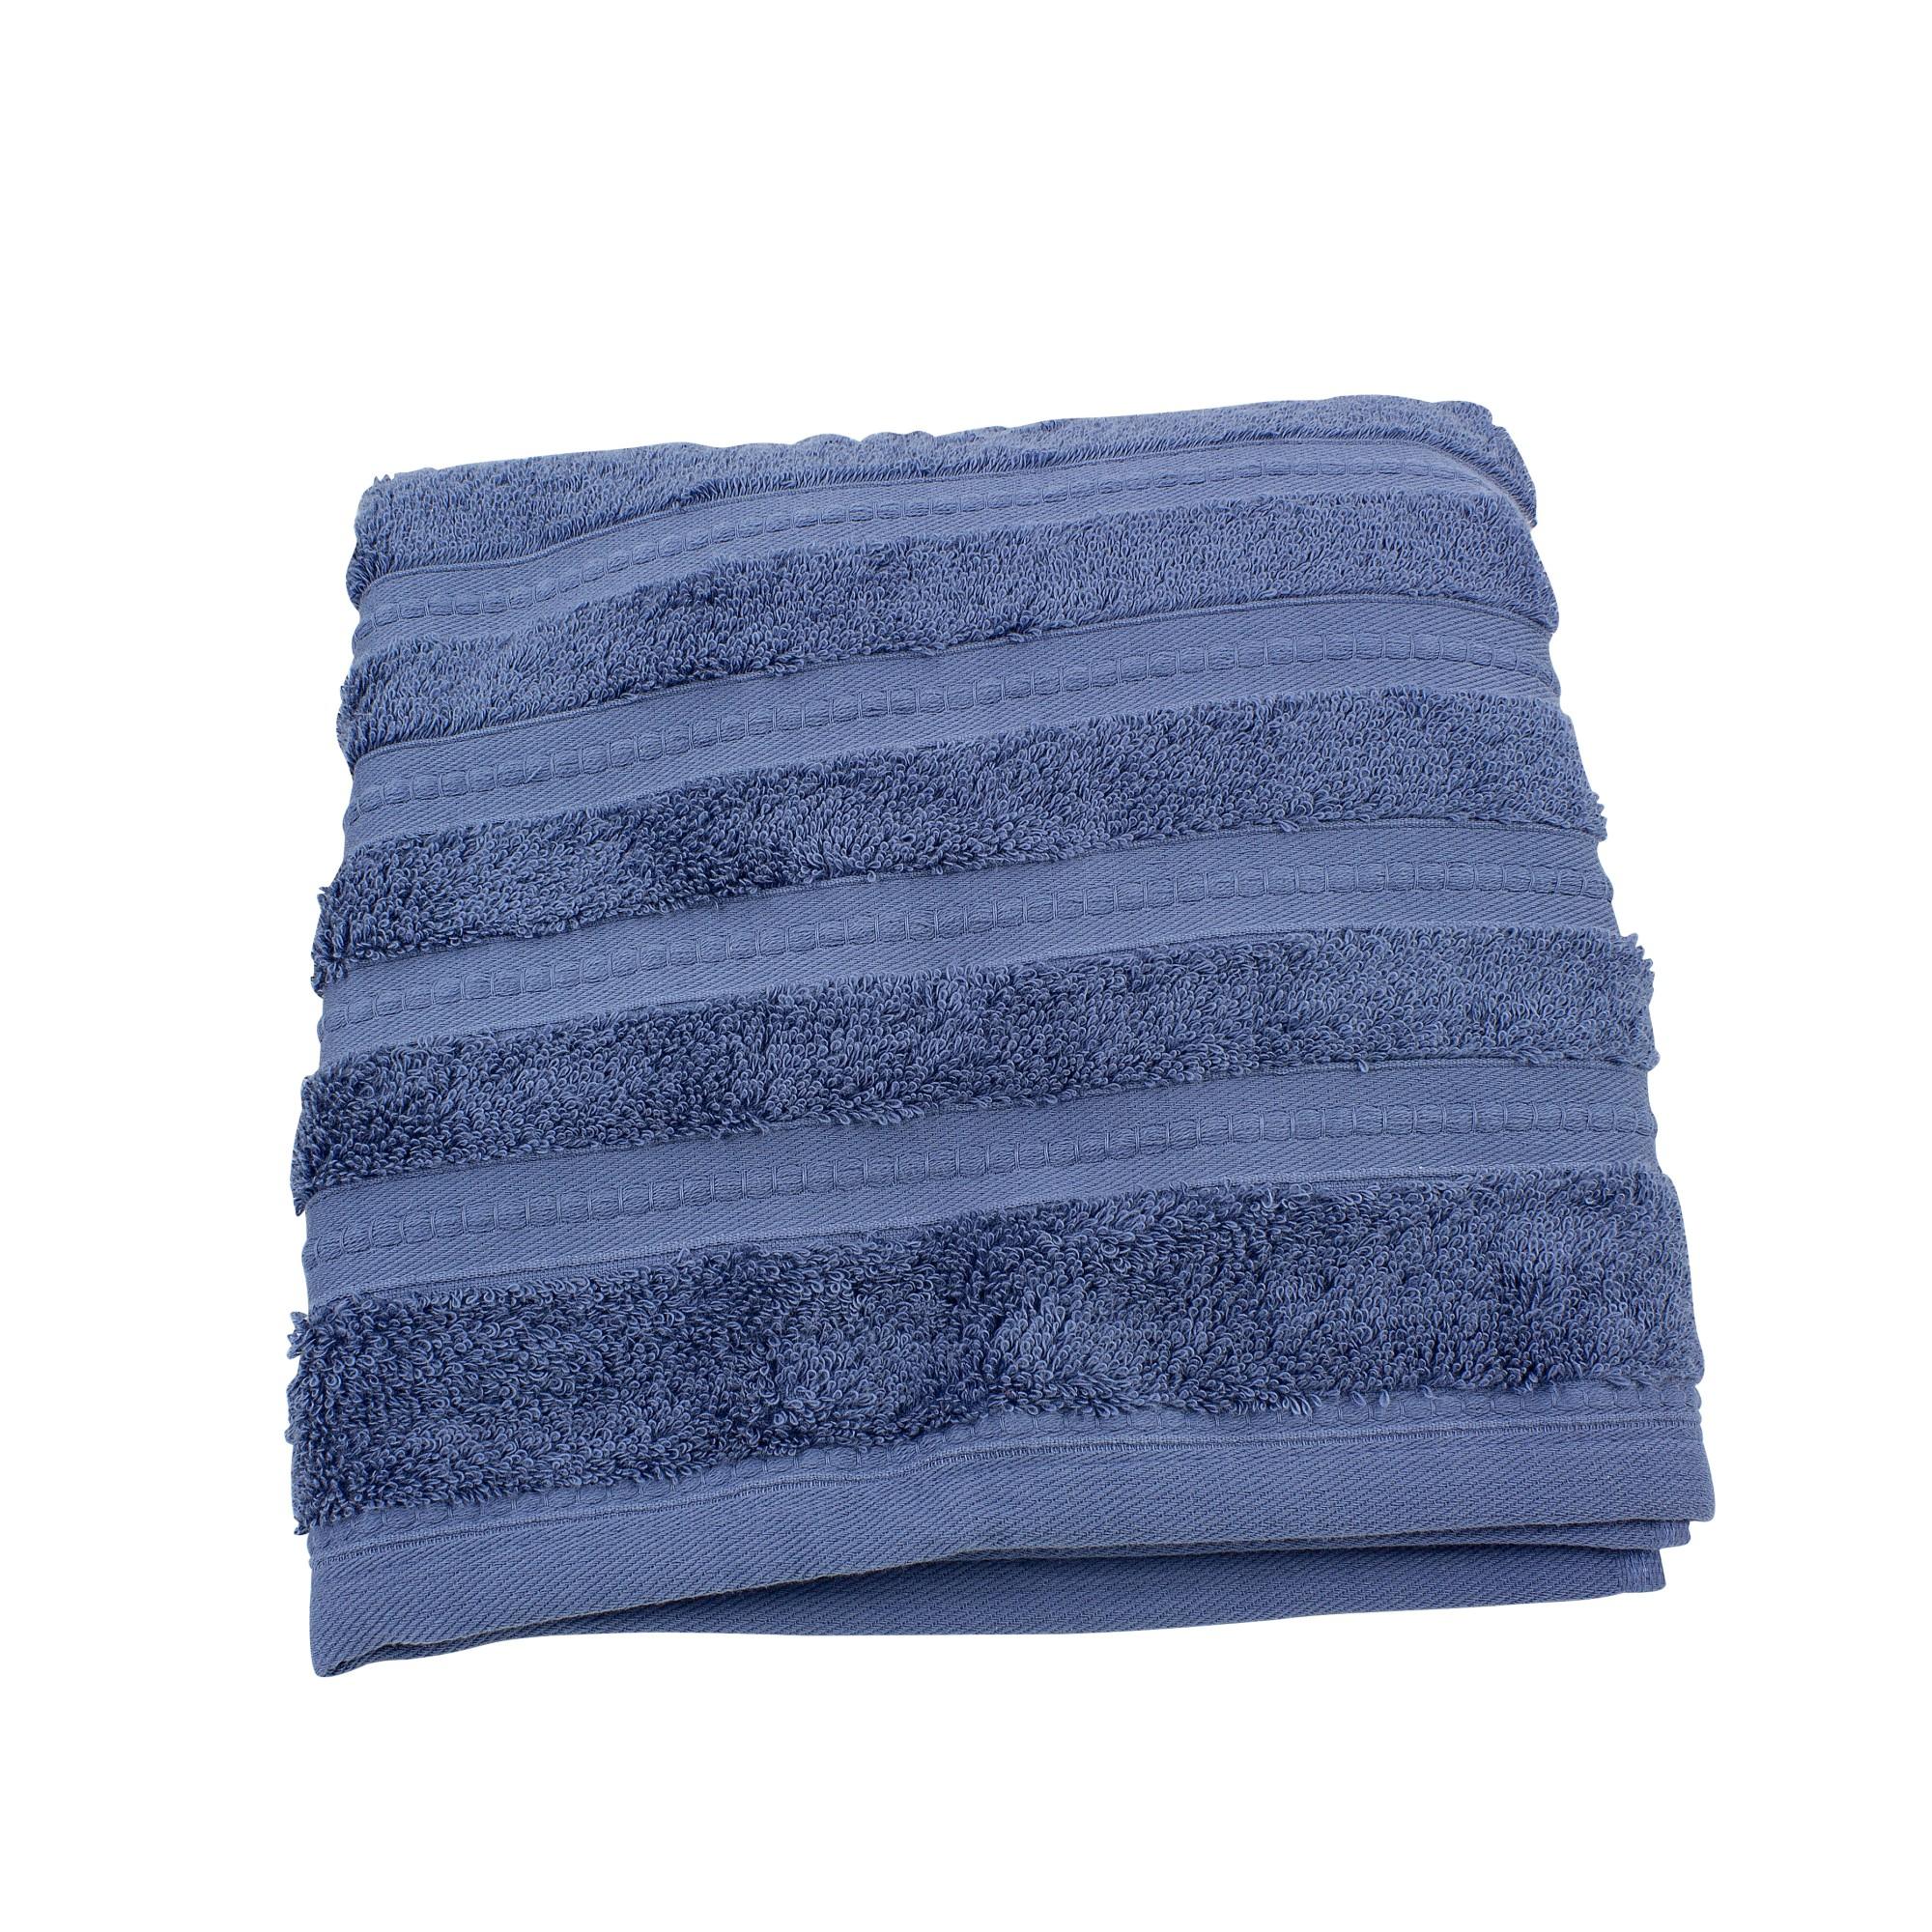 Toalha de Banho Eternity 100 Algodao 80x150 cm Jeans - Coteminas